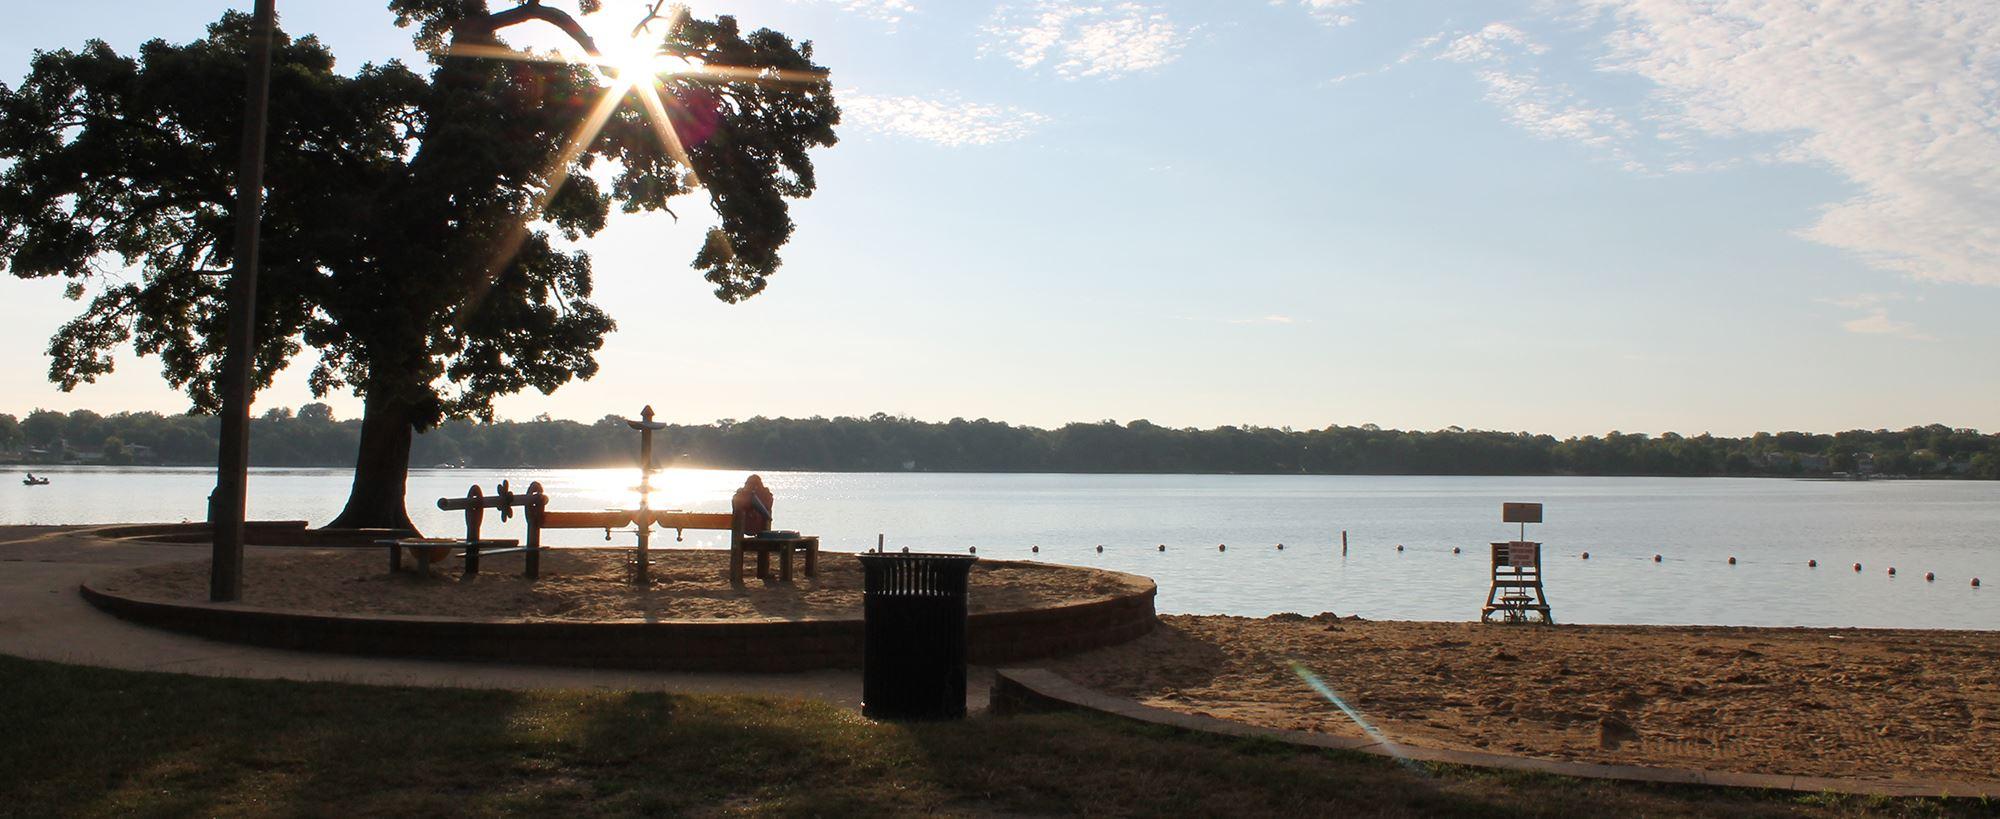 Round Lake Beach Limousine Services